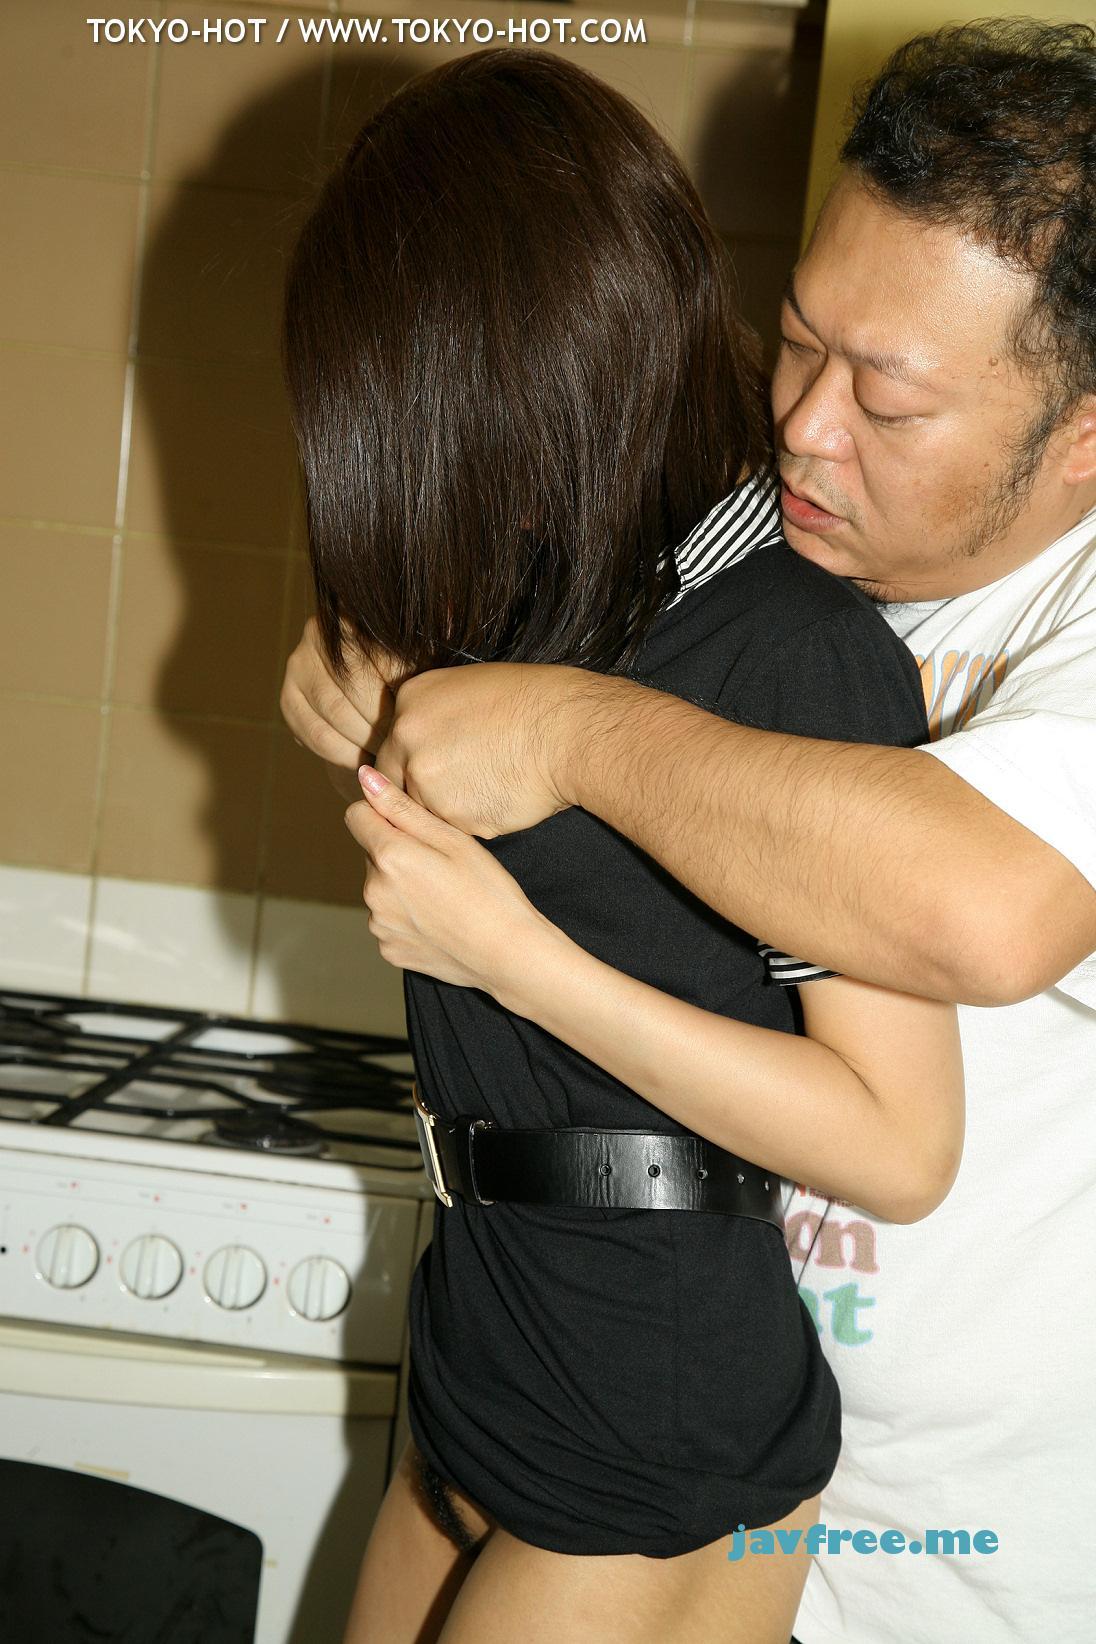 Tokyo Hot n0486 人気女優悔恨廻死嬲凹汁 愛音ゆり 愛音ゆり Tokyo Hot